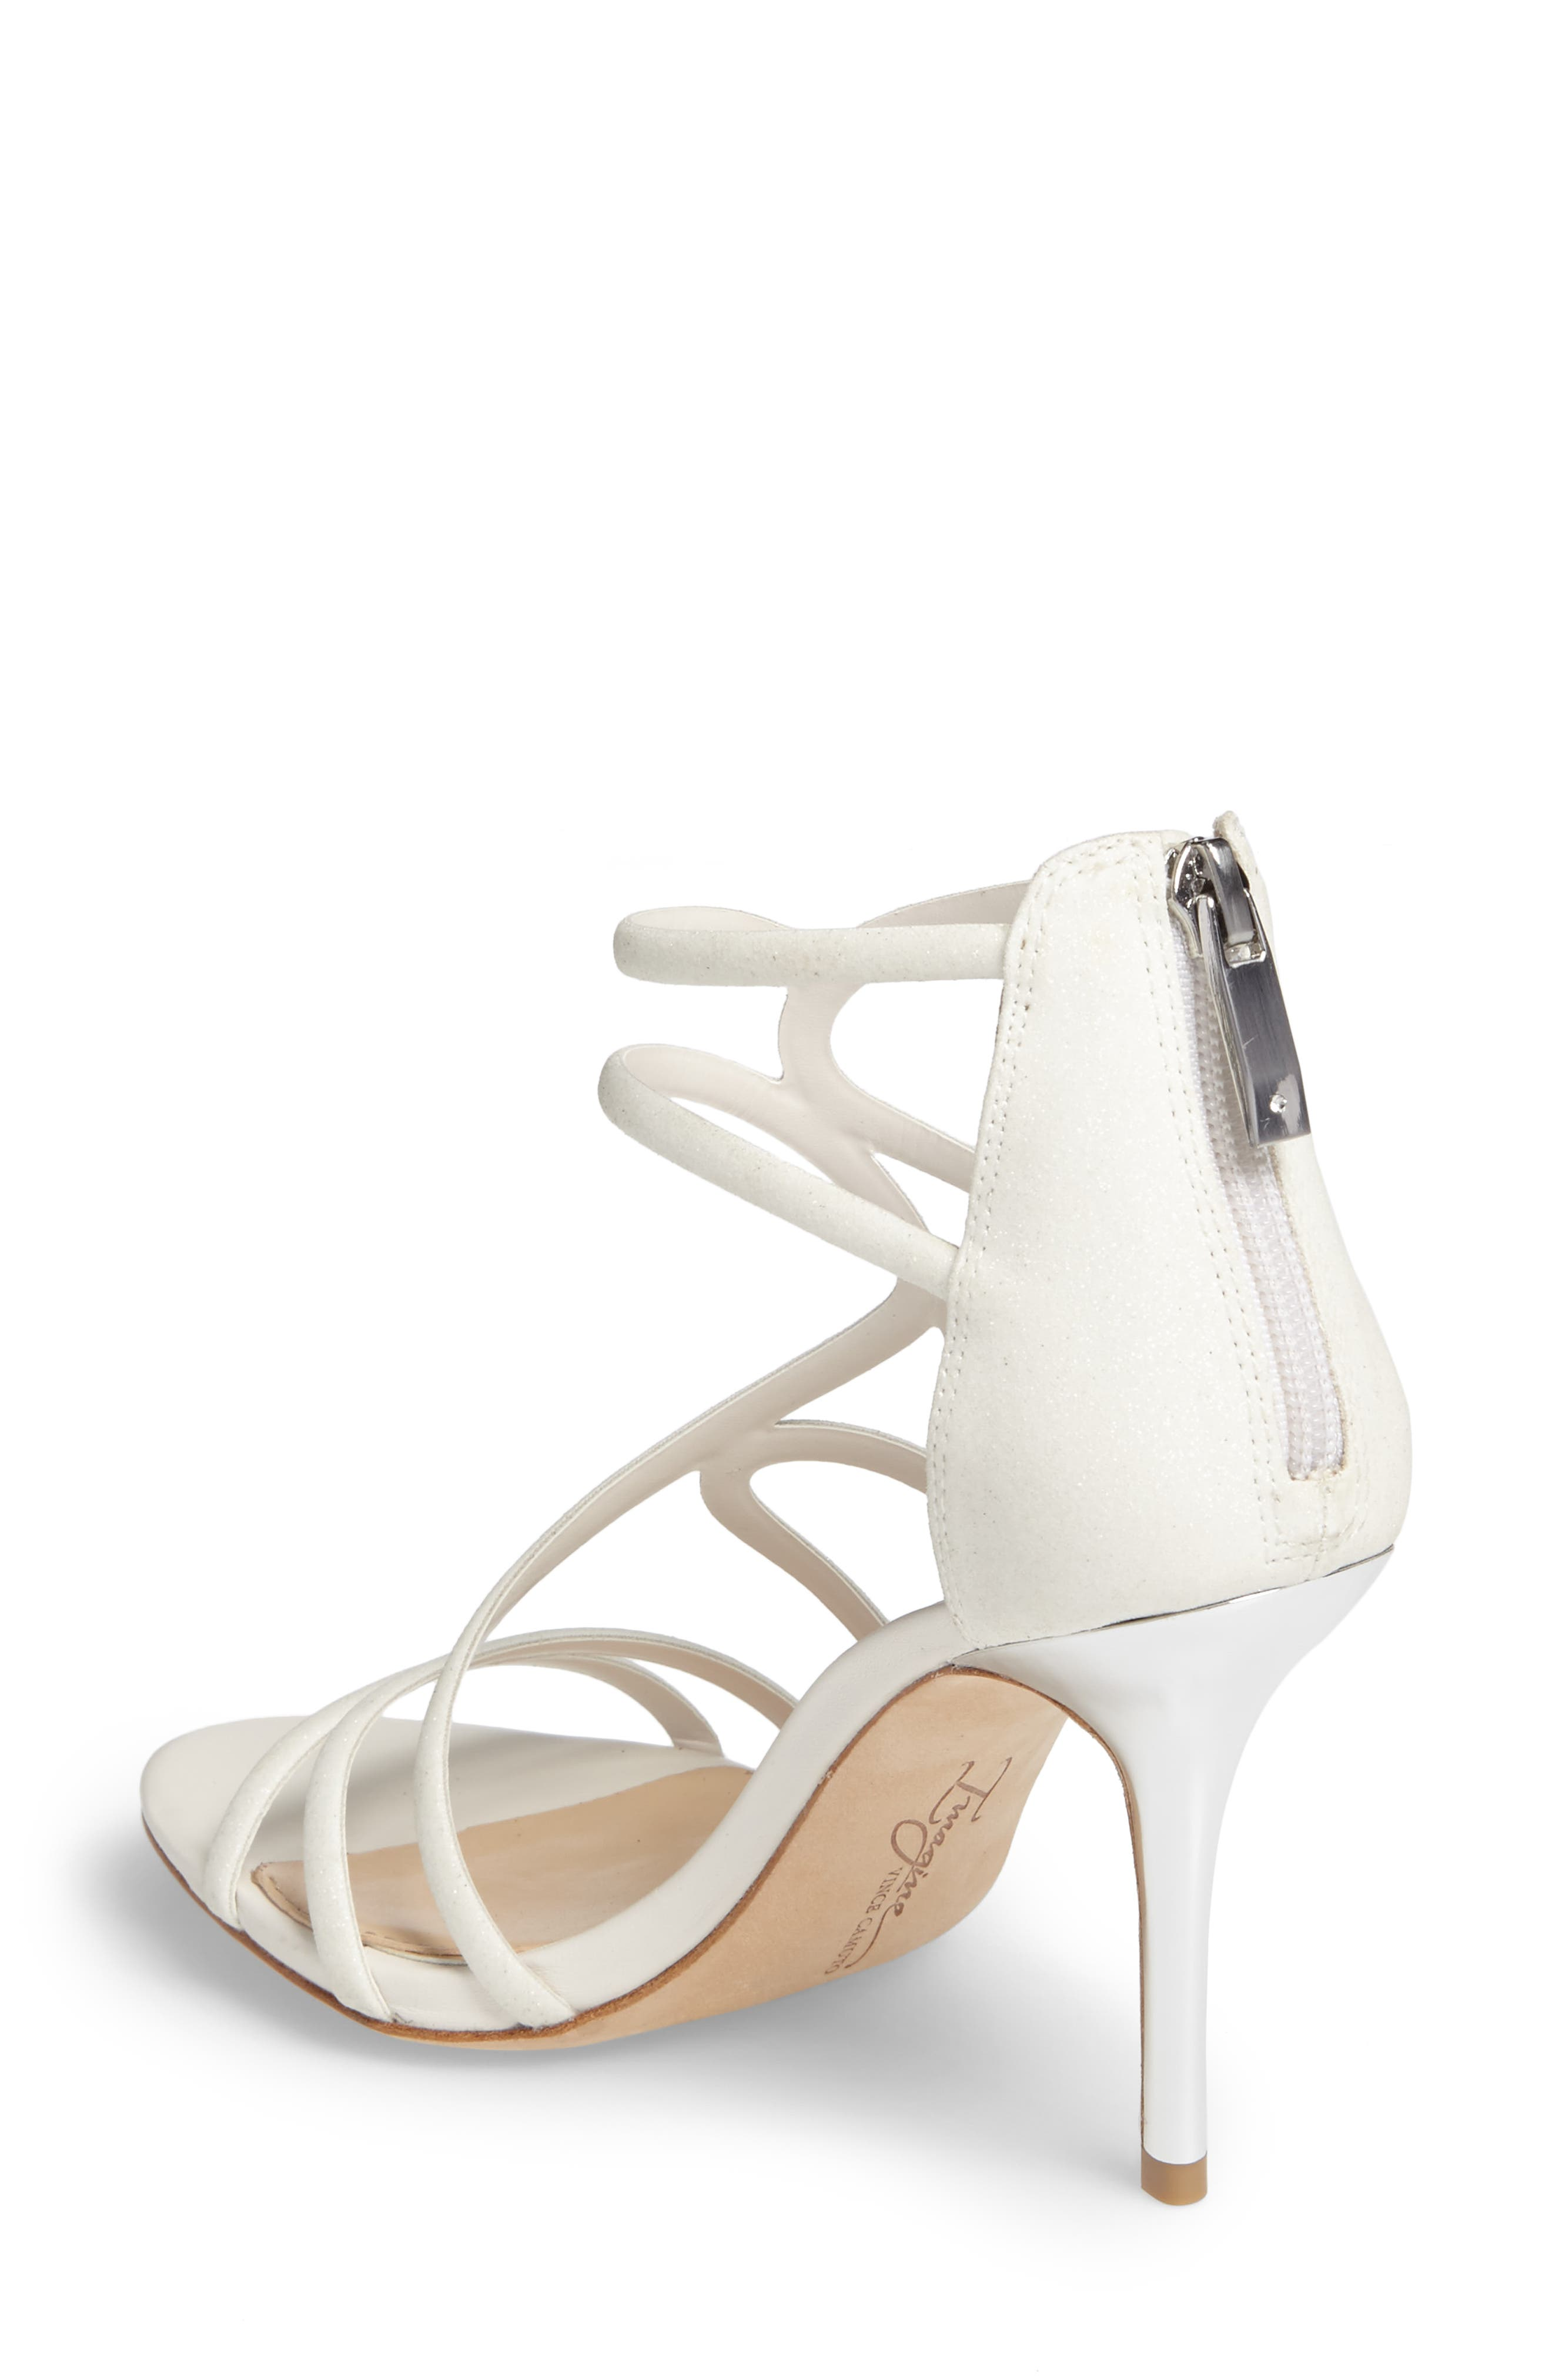 Alternate Image 2  - Imagine by Vince Camuto 'Ranee' Dress Sandal (Women)